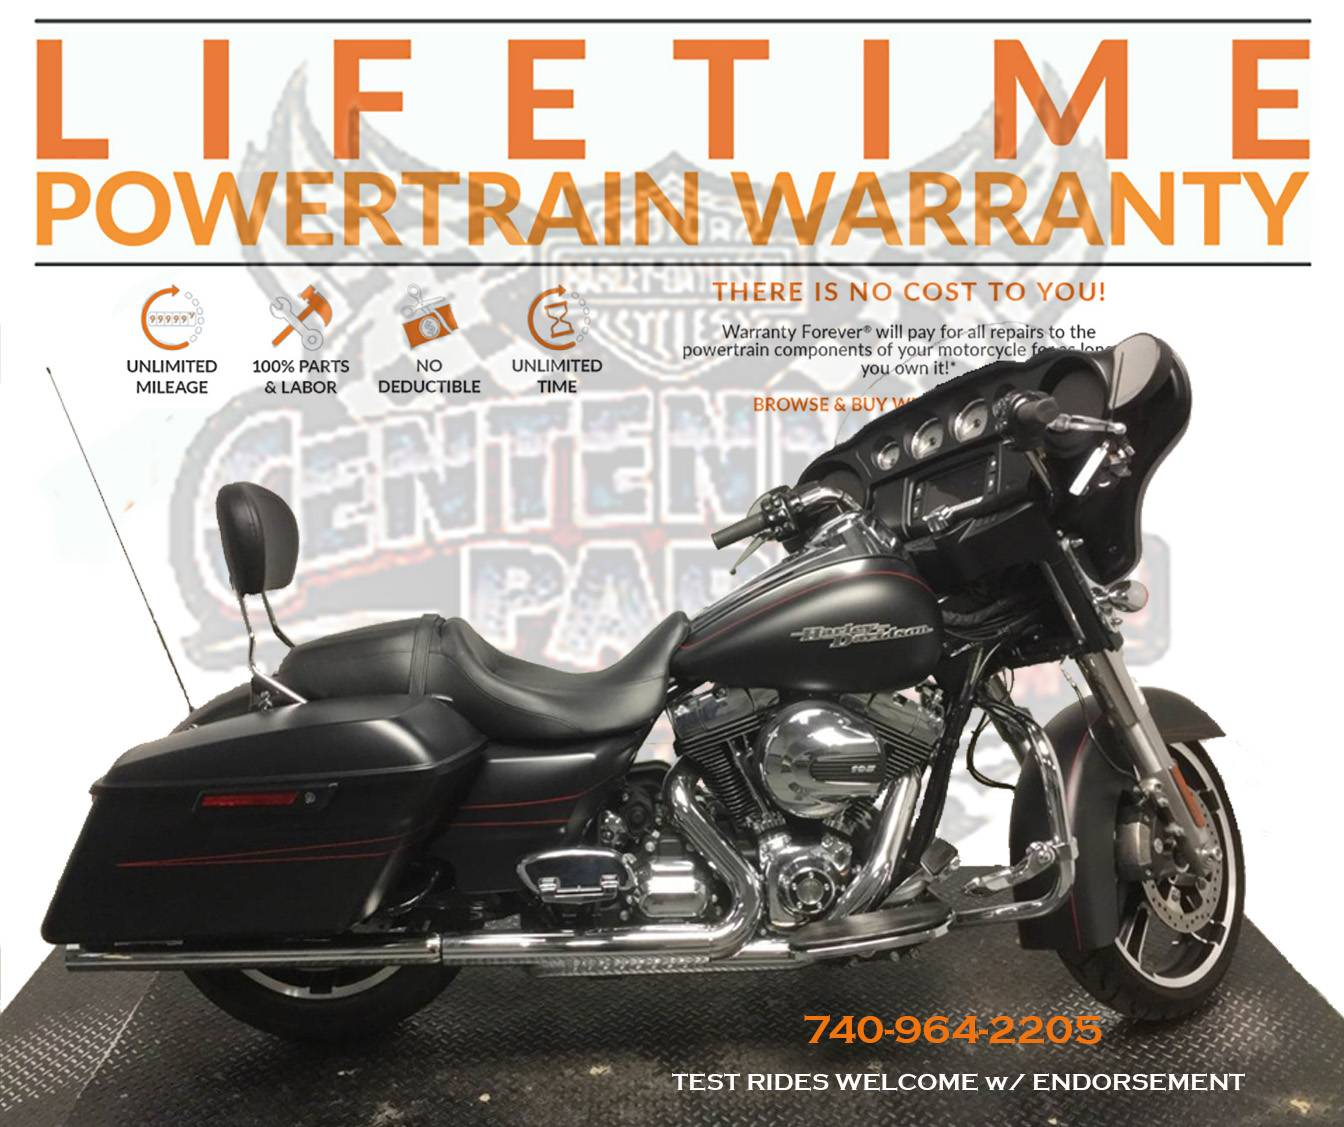 2016 Harley Davidson Street Glide Special In Sunbury Ohio Photo 1